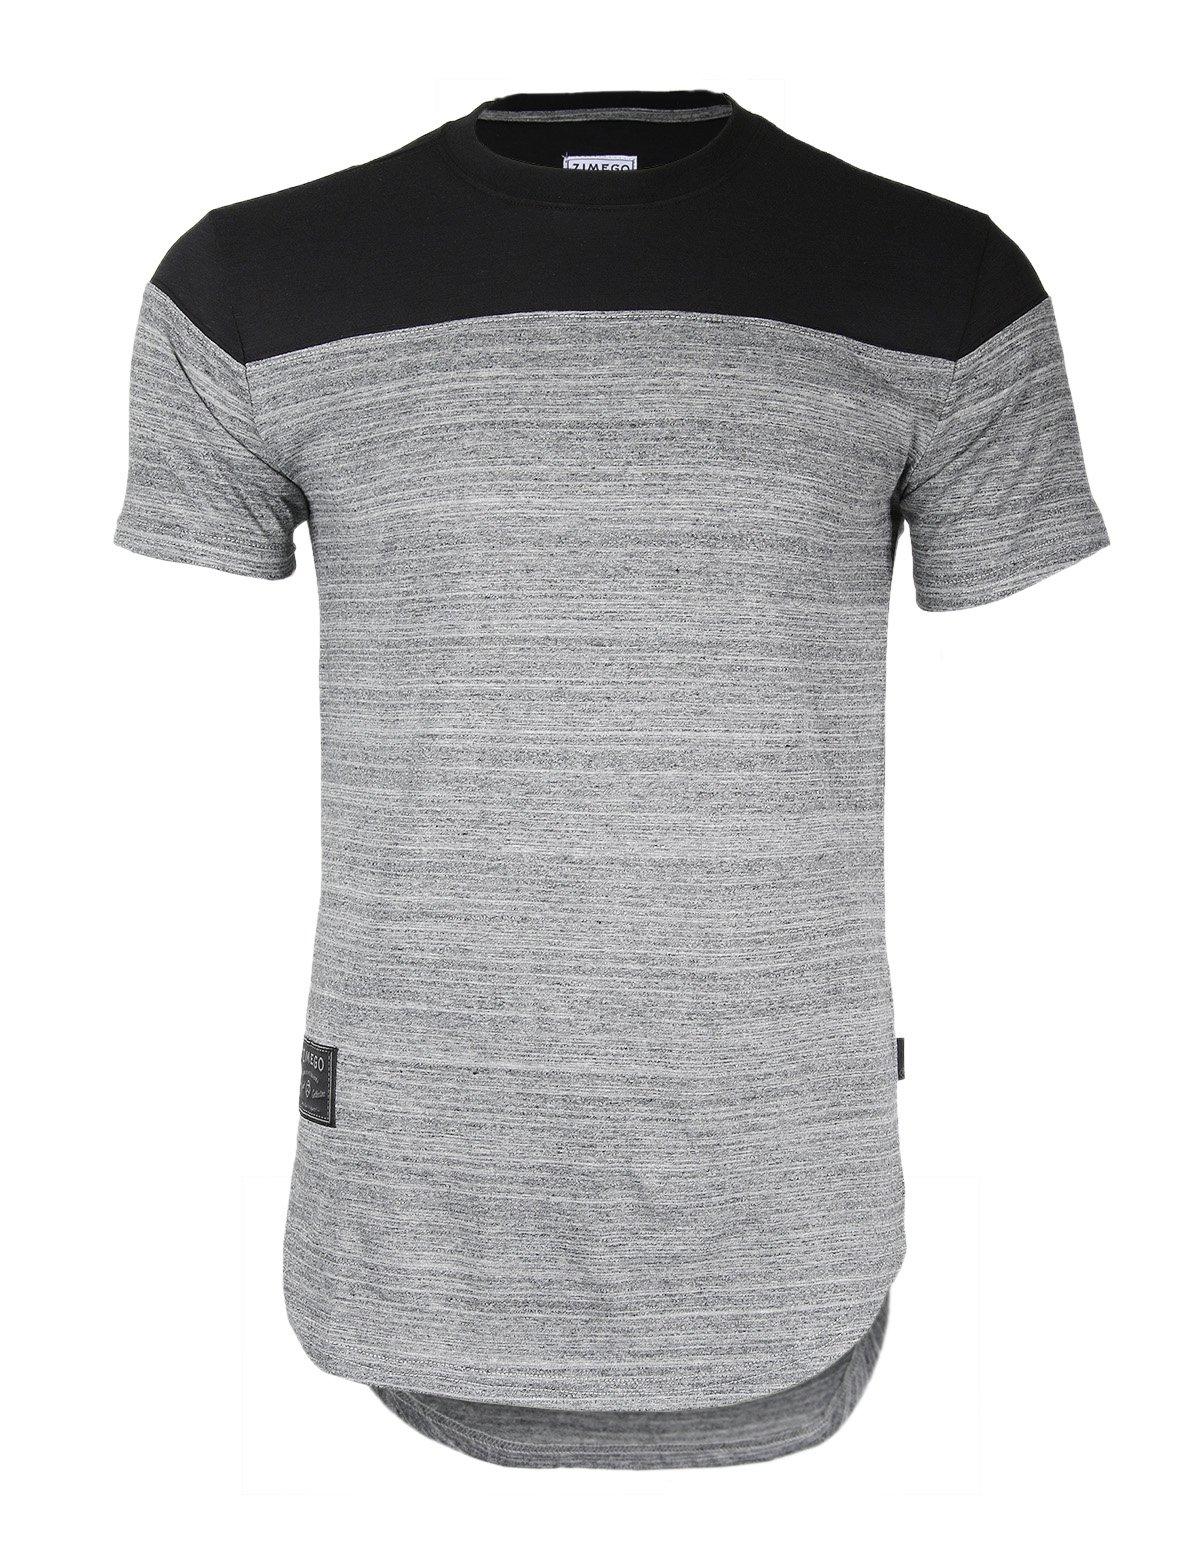 ZIMEGO Men's Short Sleeve Semi Longline Round Bottom Hip-hop Hipster T-Shirts (Large, ZFSS458-FBMerchant)